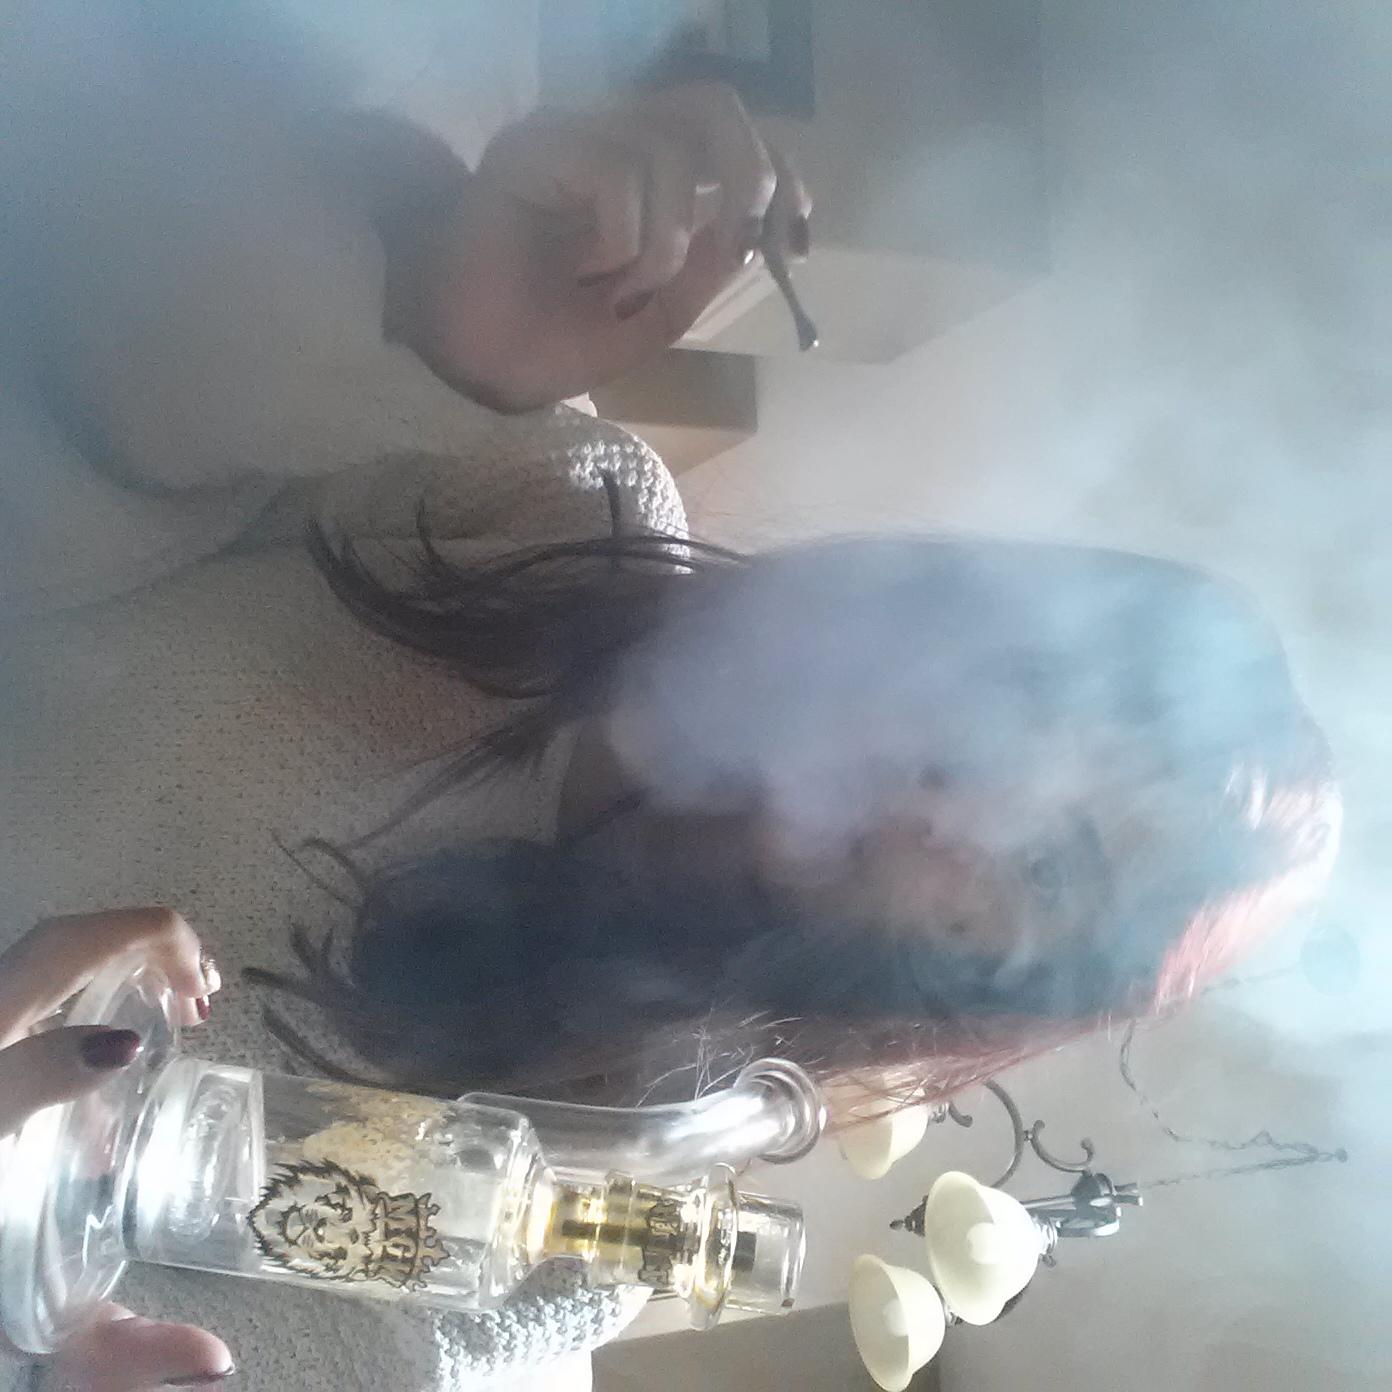 Room full of weed smoke